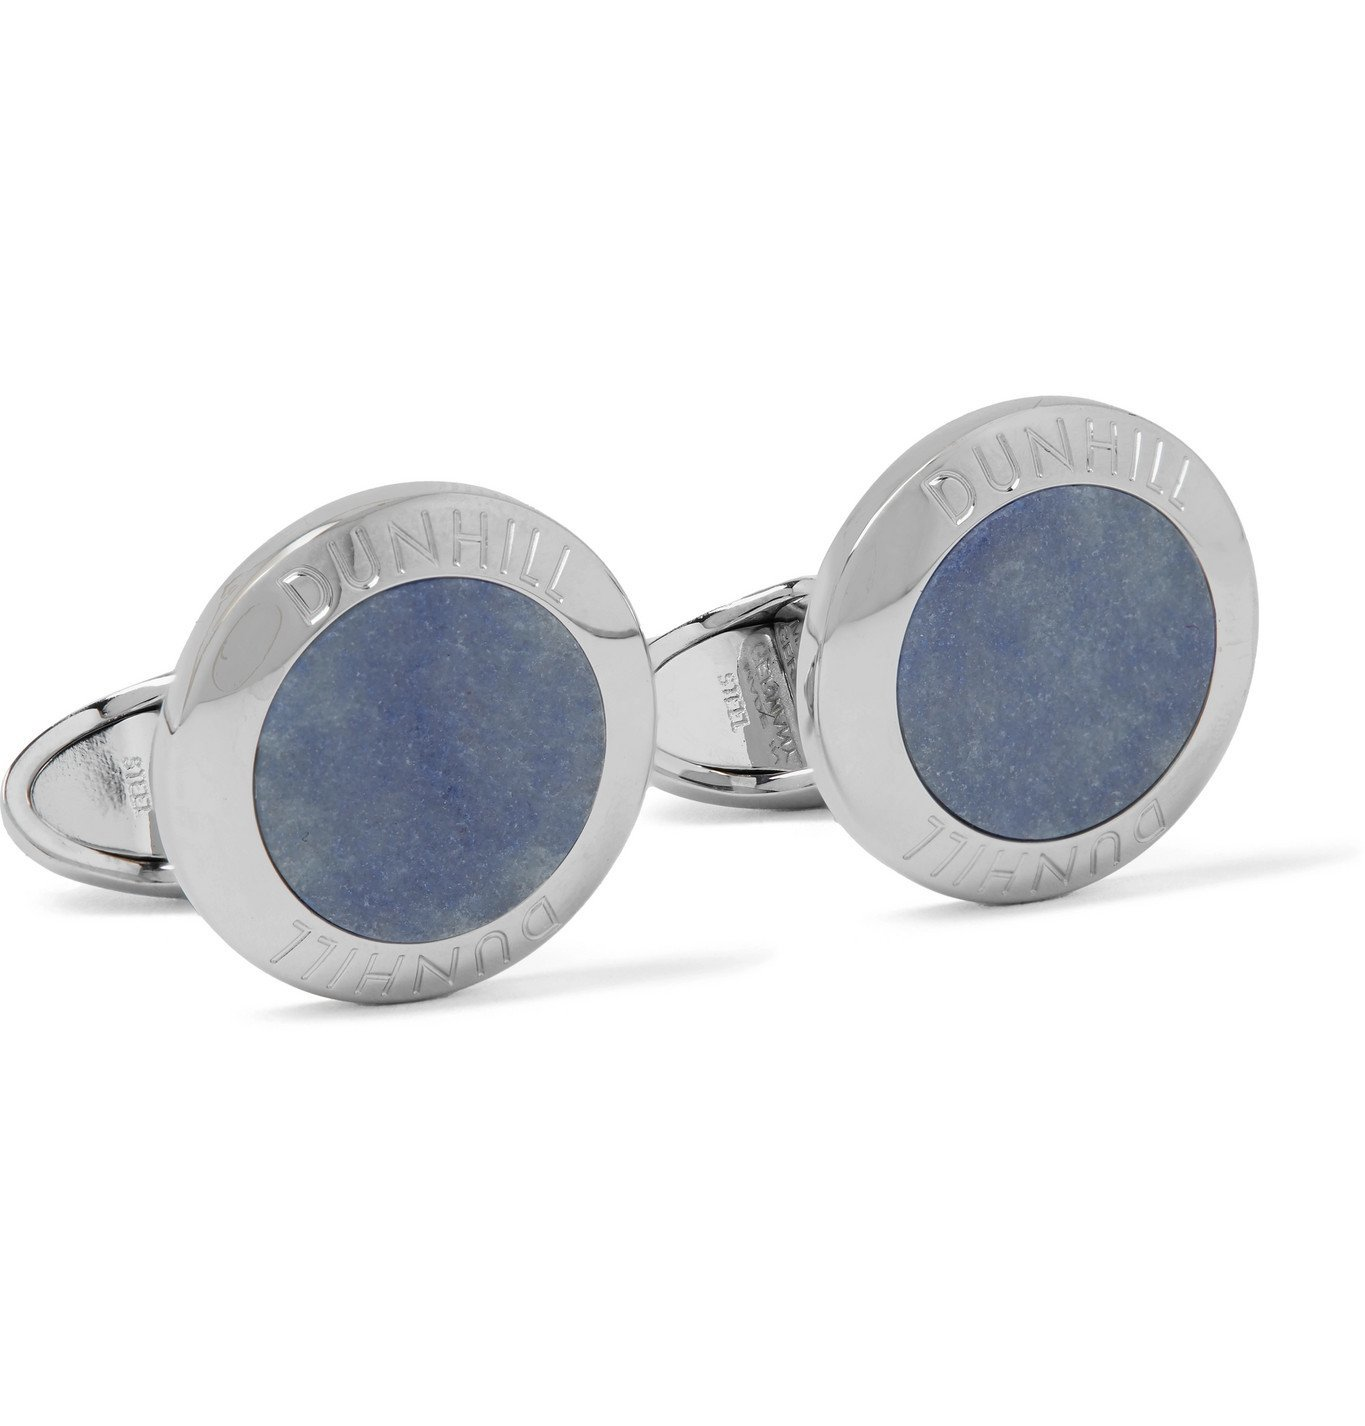 DUNHILL - Logo-Engraved Rhodium-Plated Agate Cufflinks - Blue